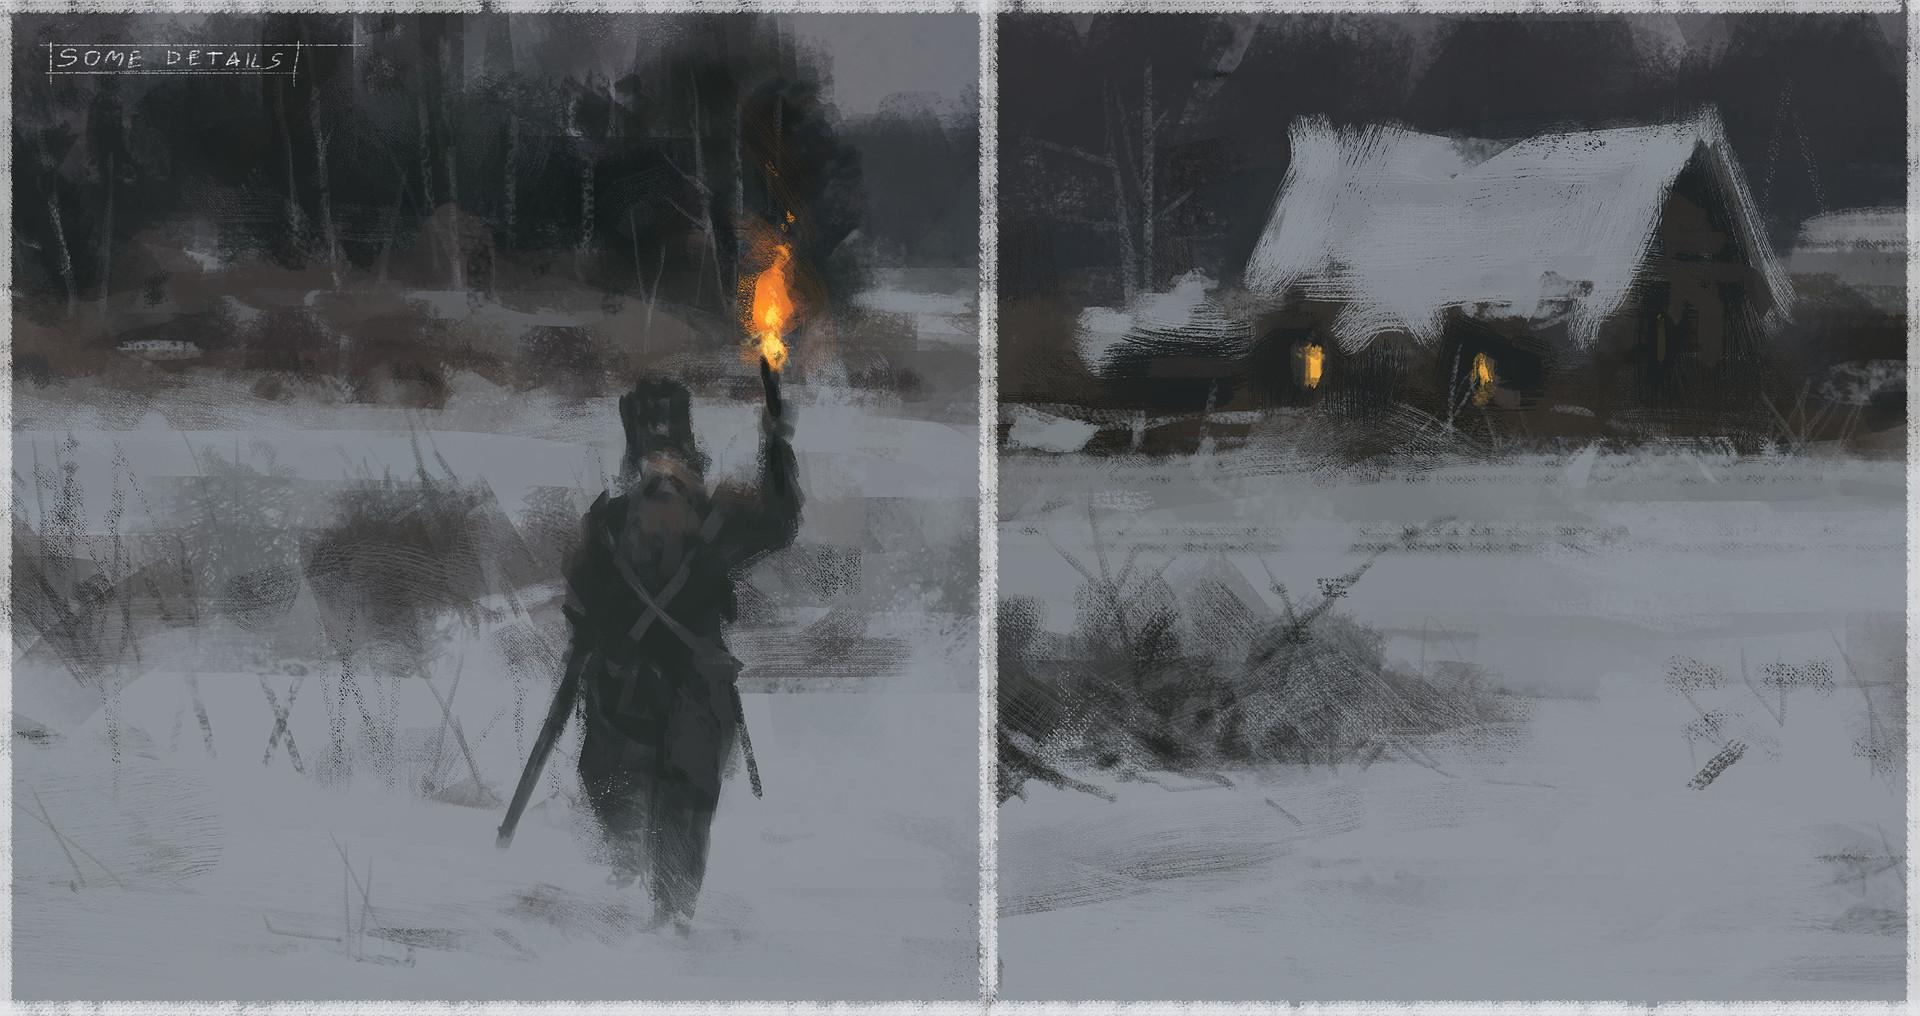 Jakub rozalski wolfpack hunt01 14112016 process05